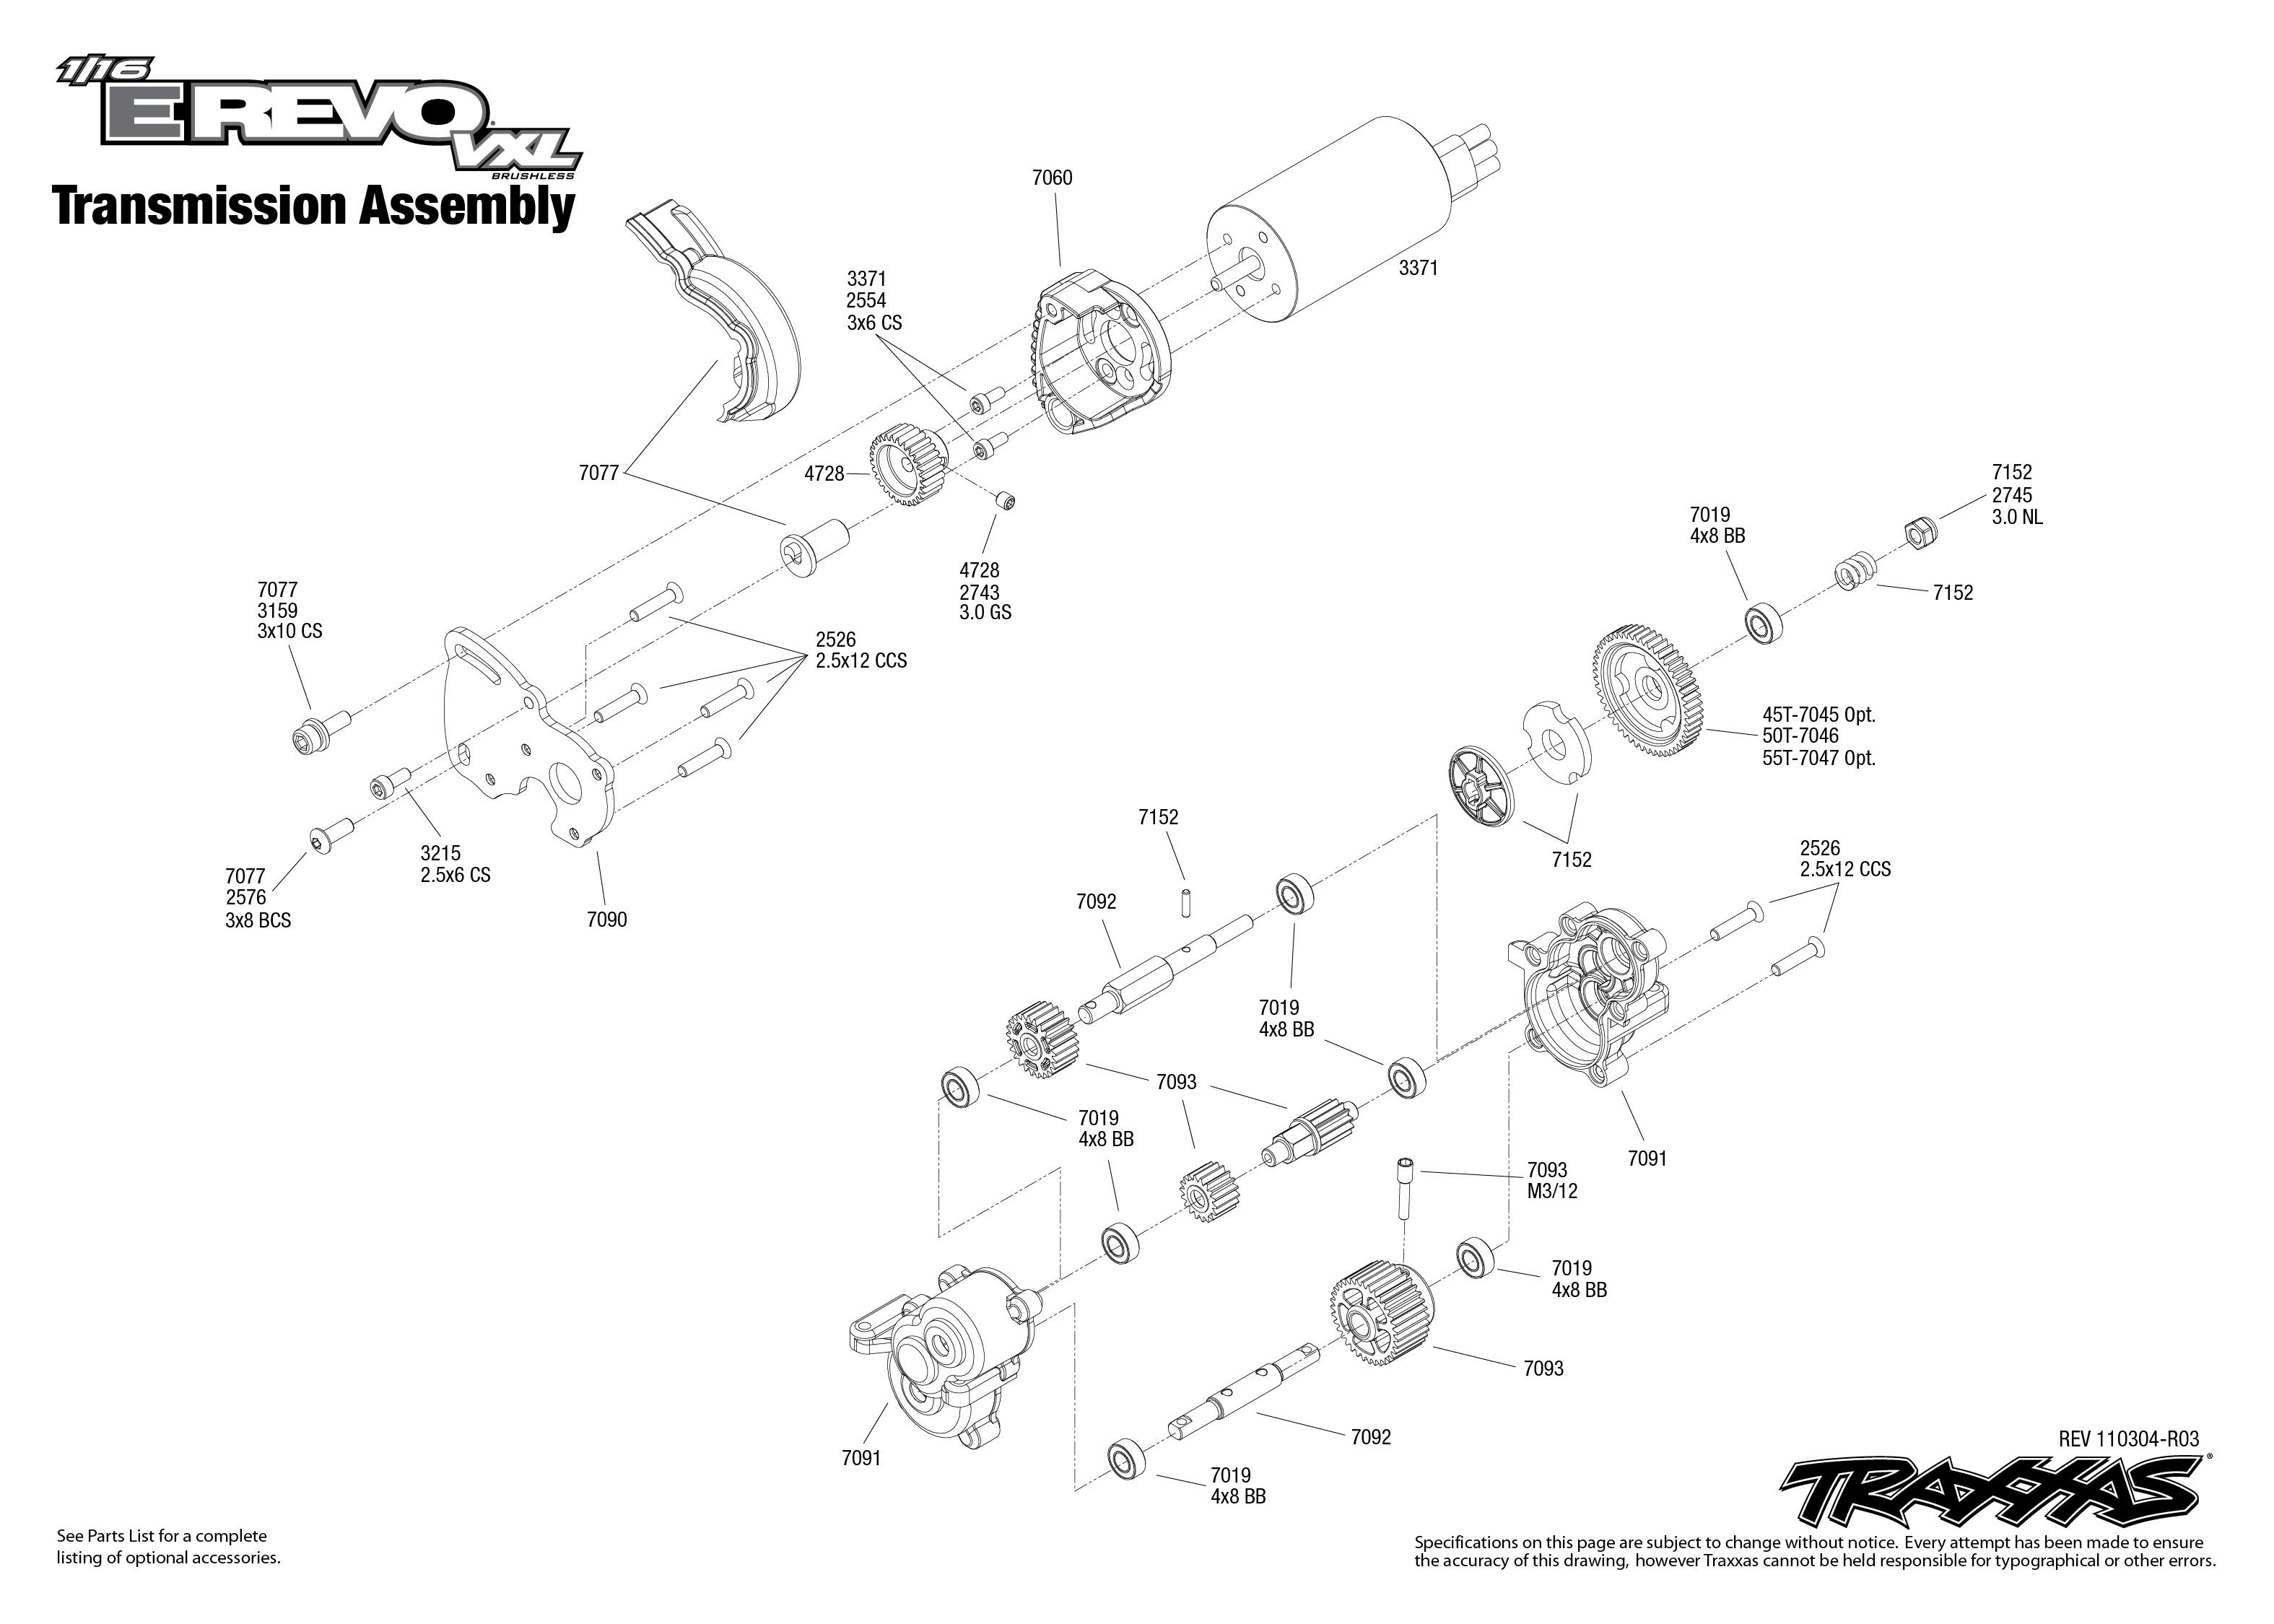 Traxxas Revo Parts Diagram : 26 Wiring Diagram Images